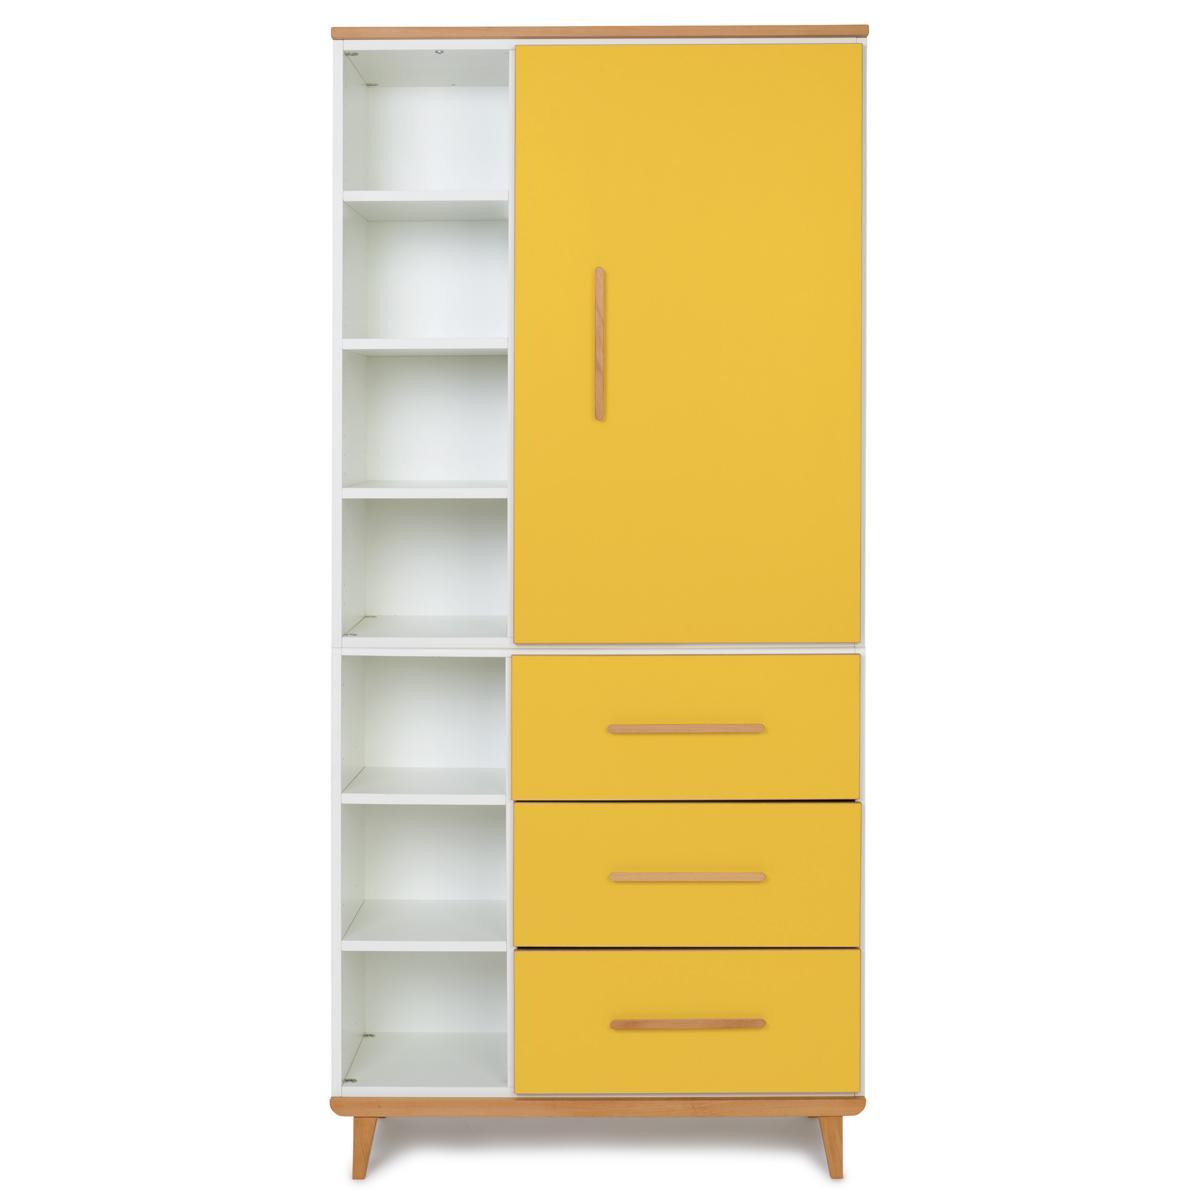 Wookids - Armoire 198cm 1 porte 3 tiroirs NADO sunshine yellow